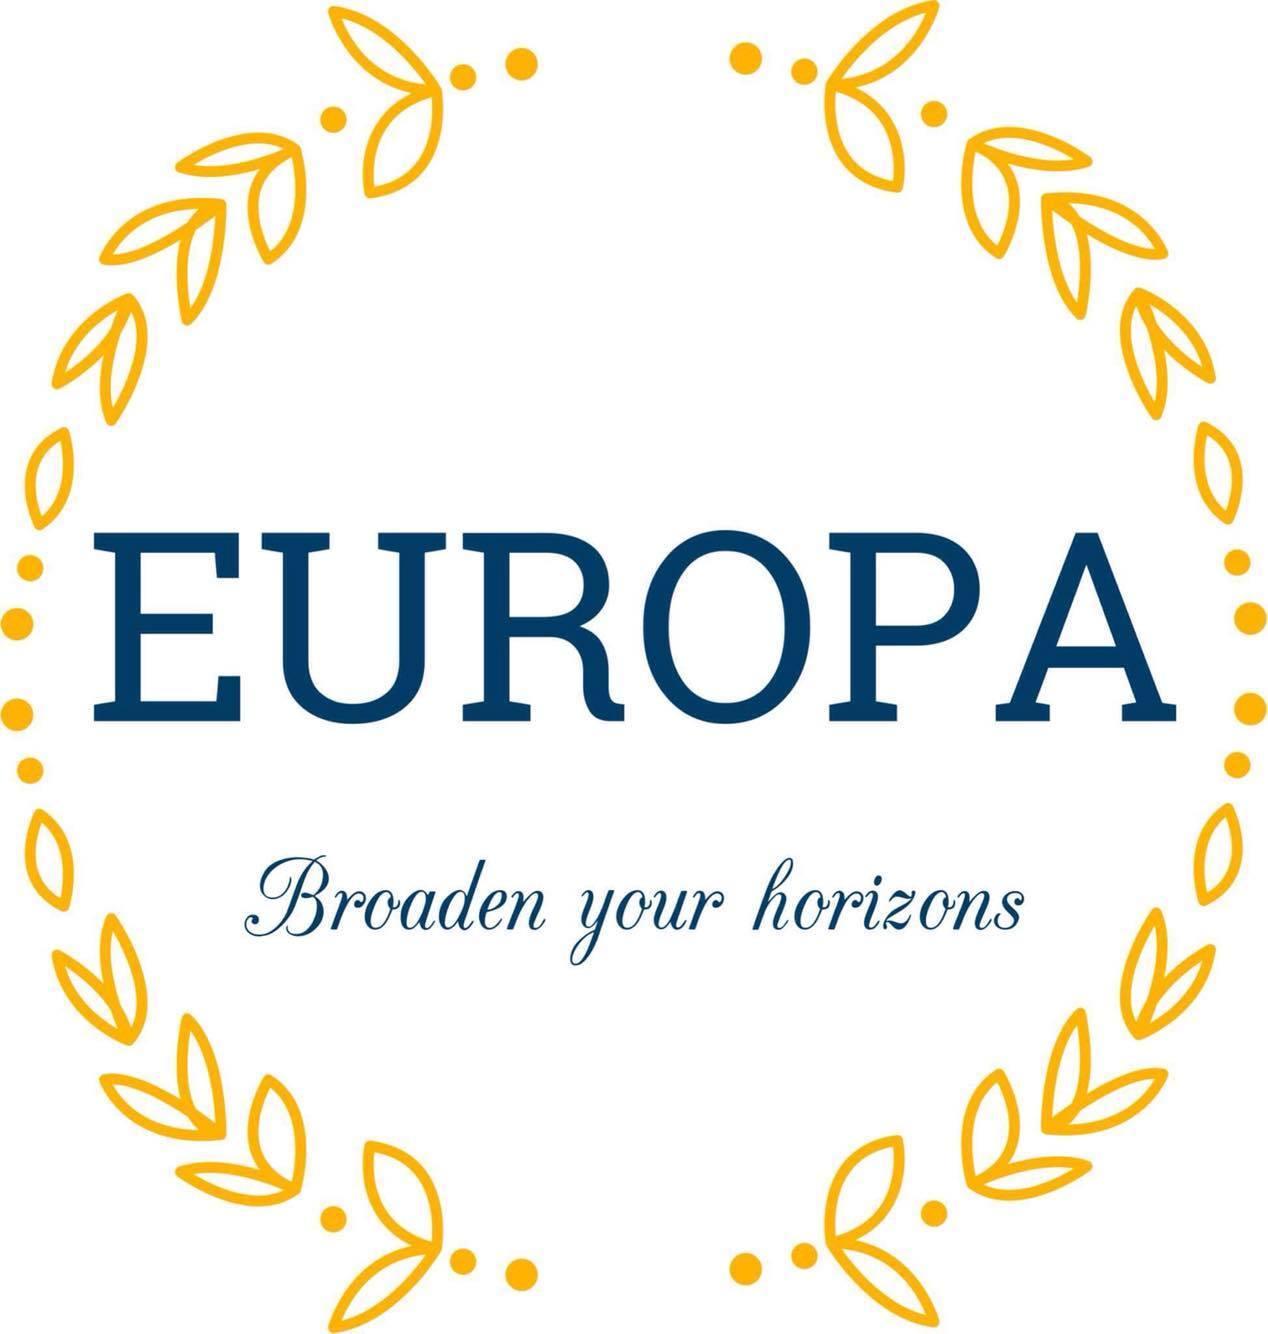 LOGO EUROPA .jpg